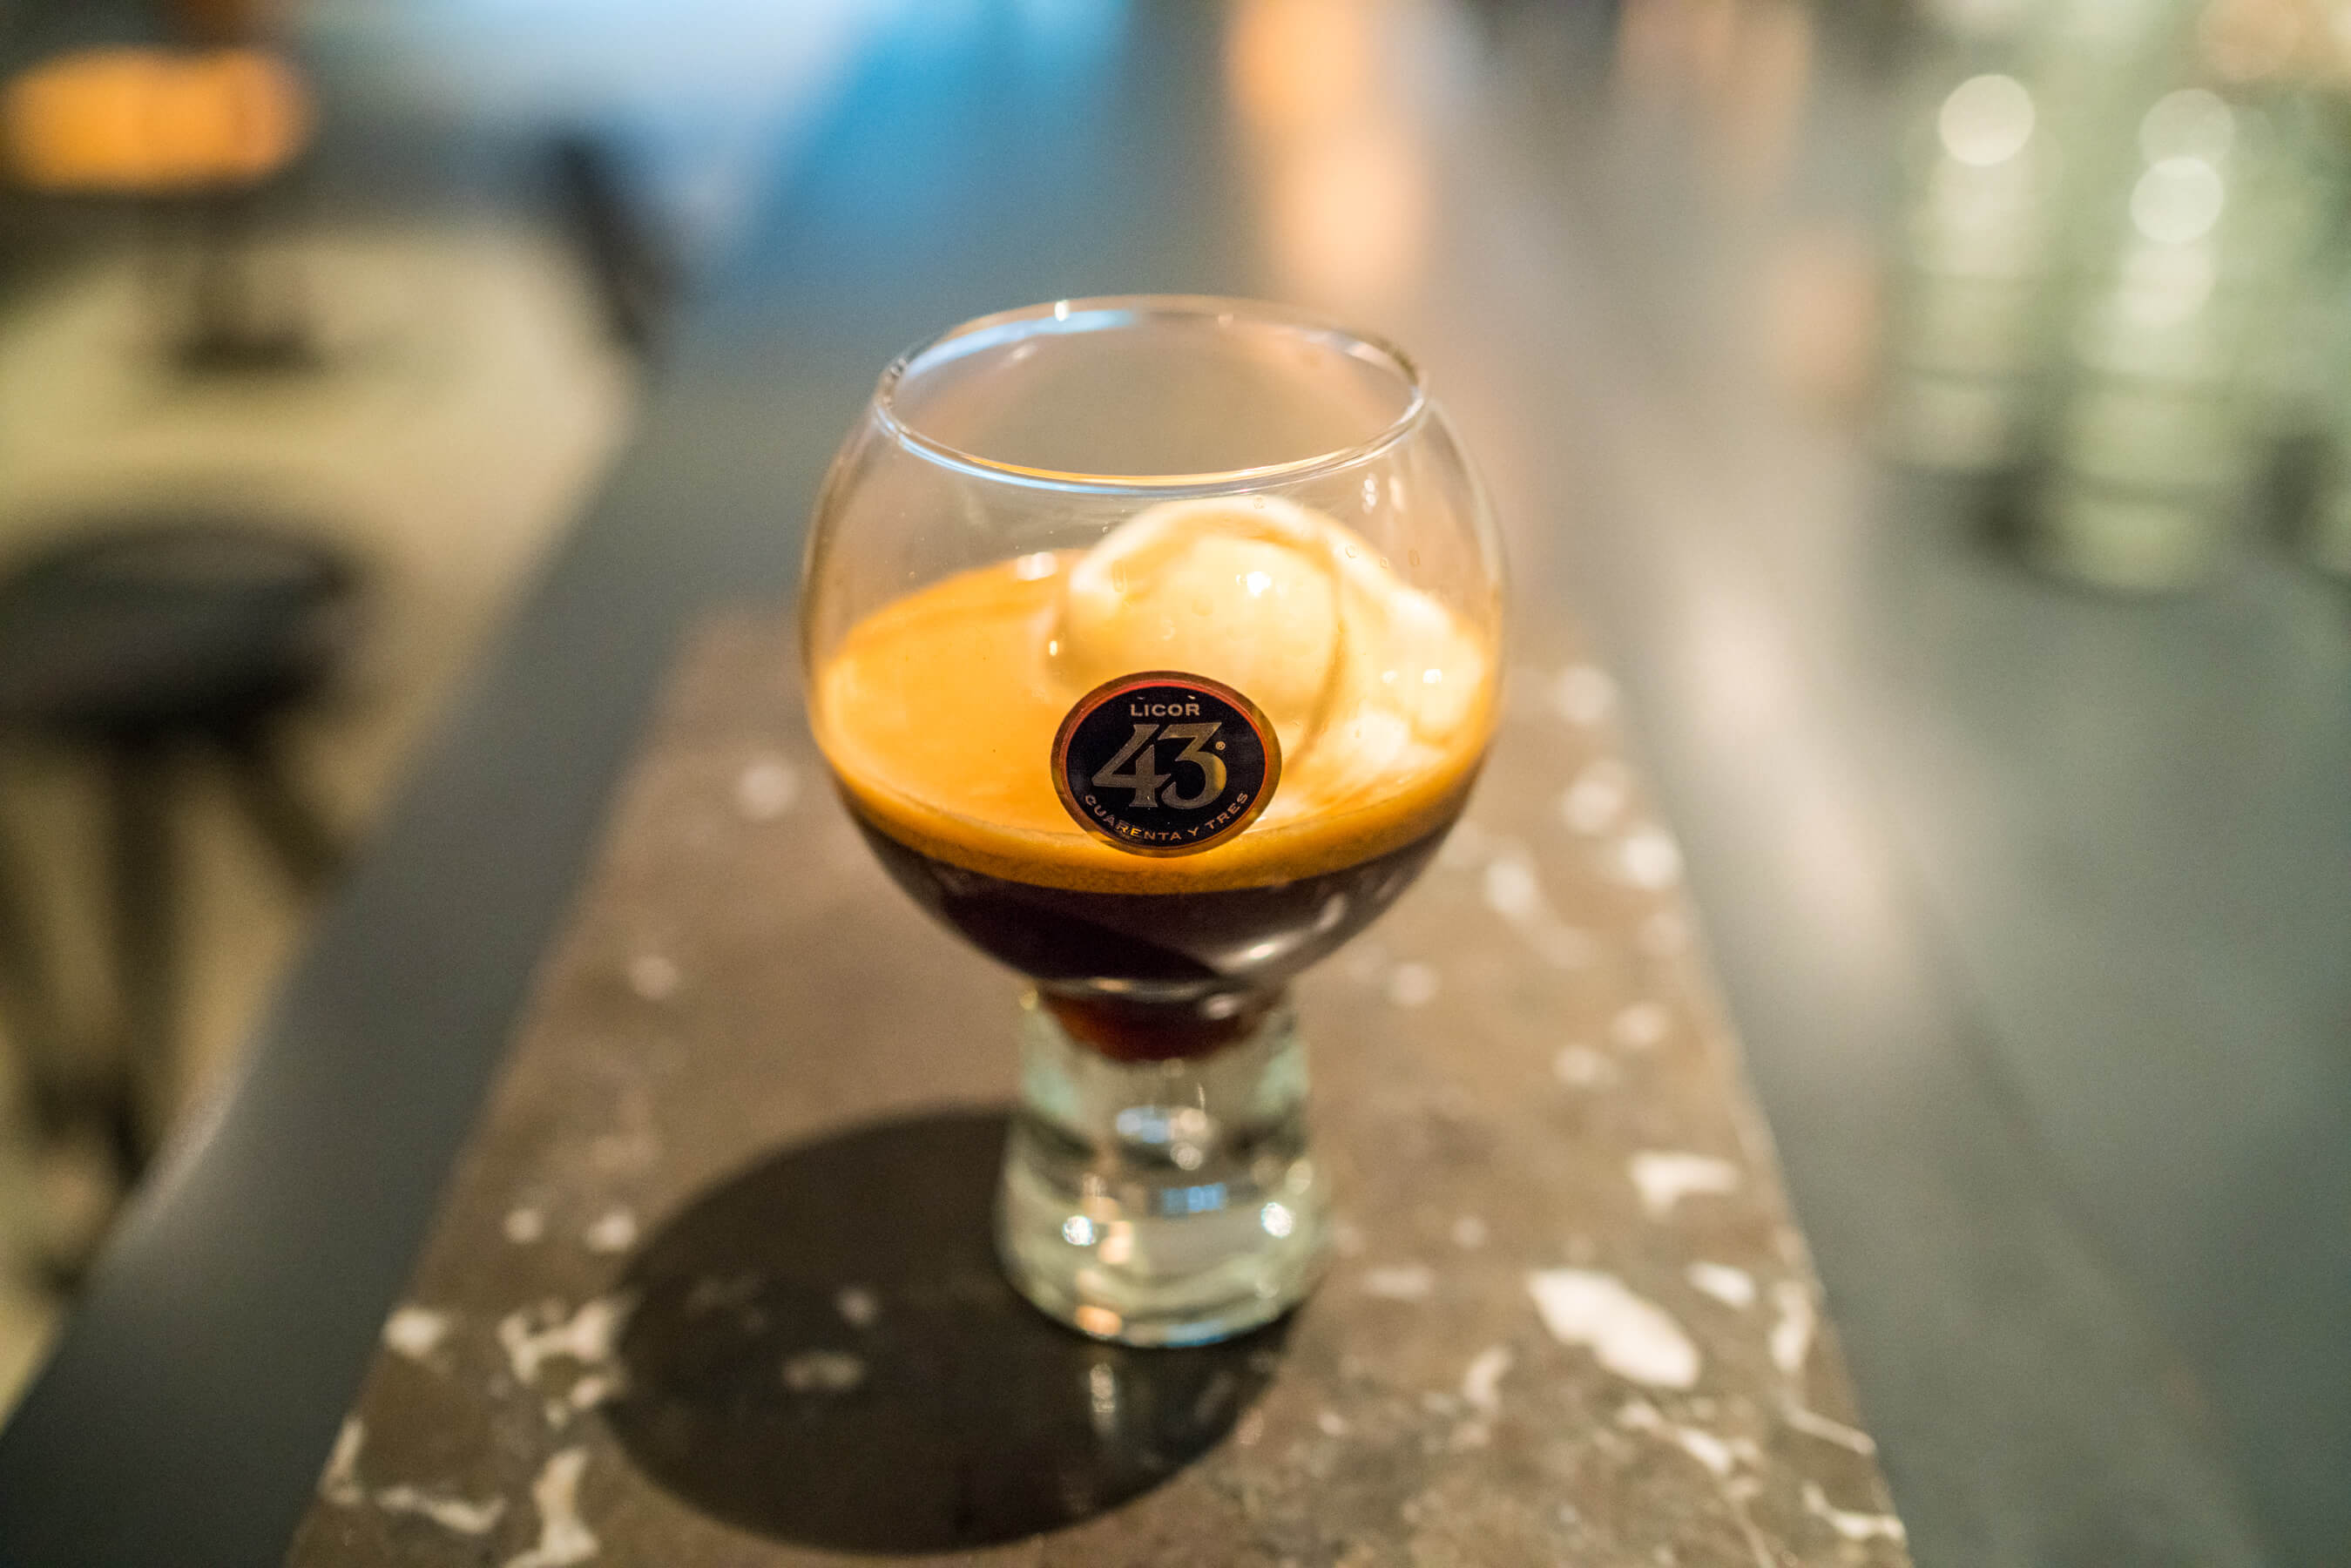 Cocktail from heaven: koffie, ijs en Licor 43 in één